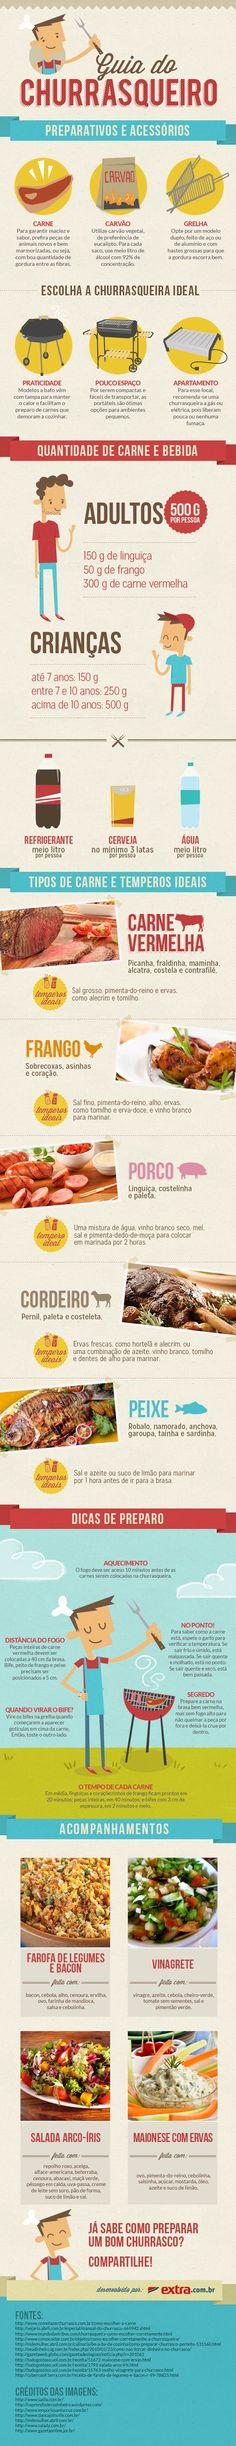 Guia do Churrasco Perfeito. #infografico #churrasco #ofertas #carnes #guiato